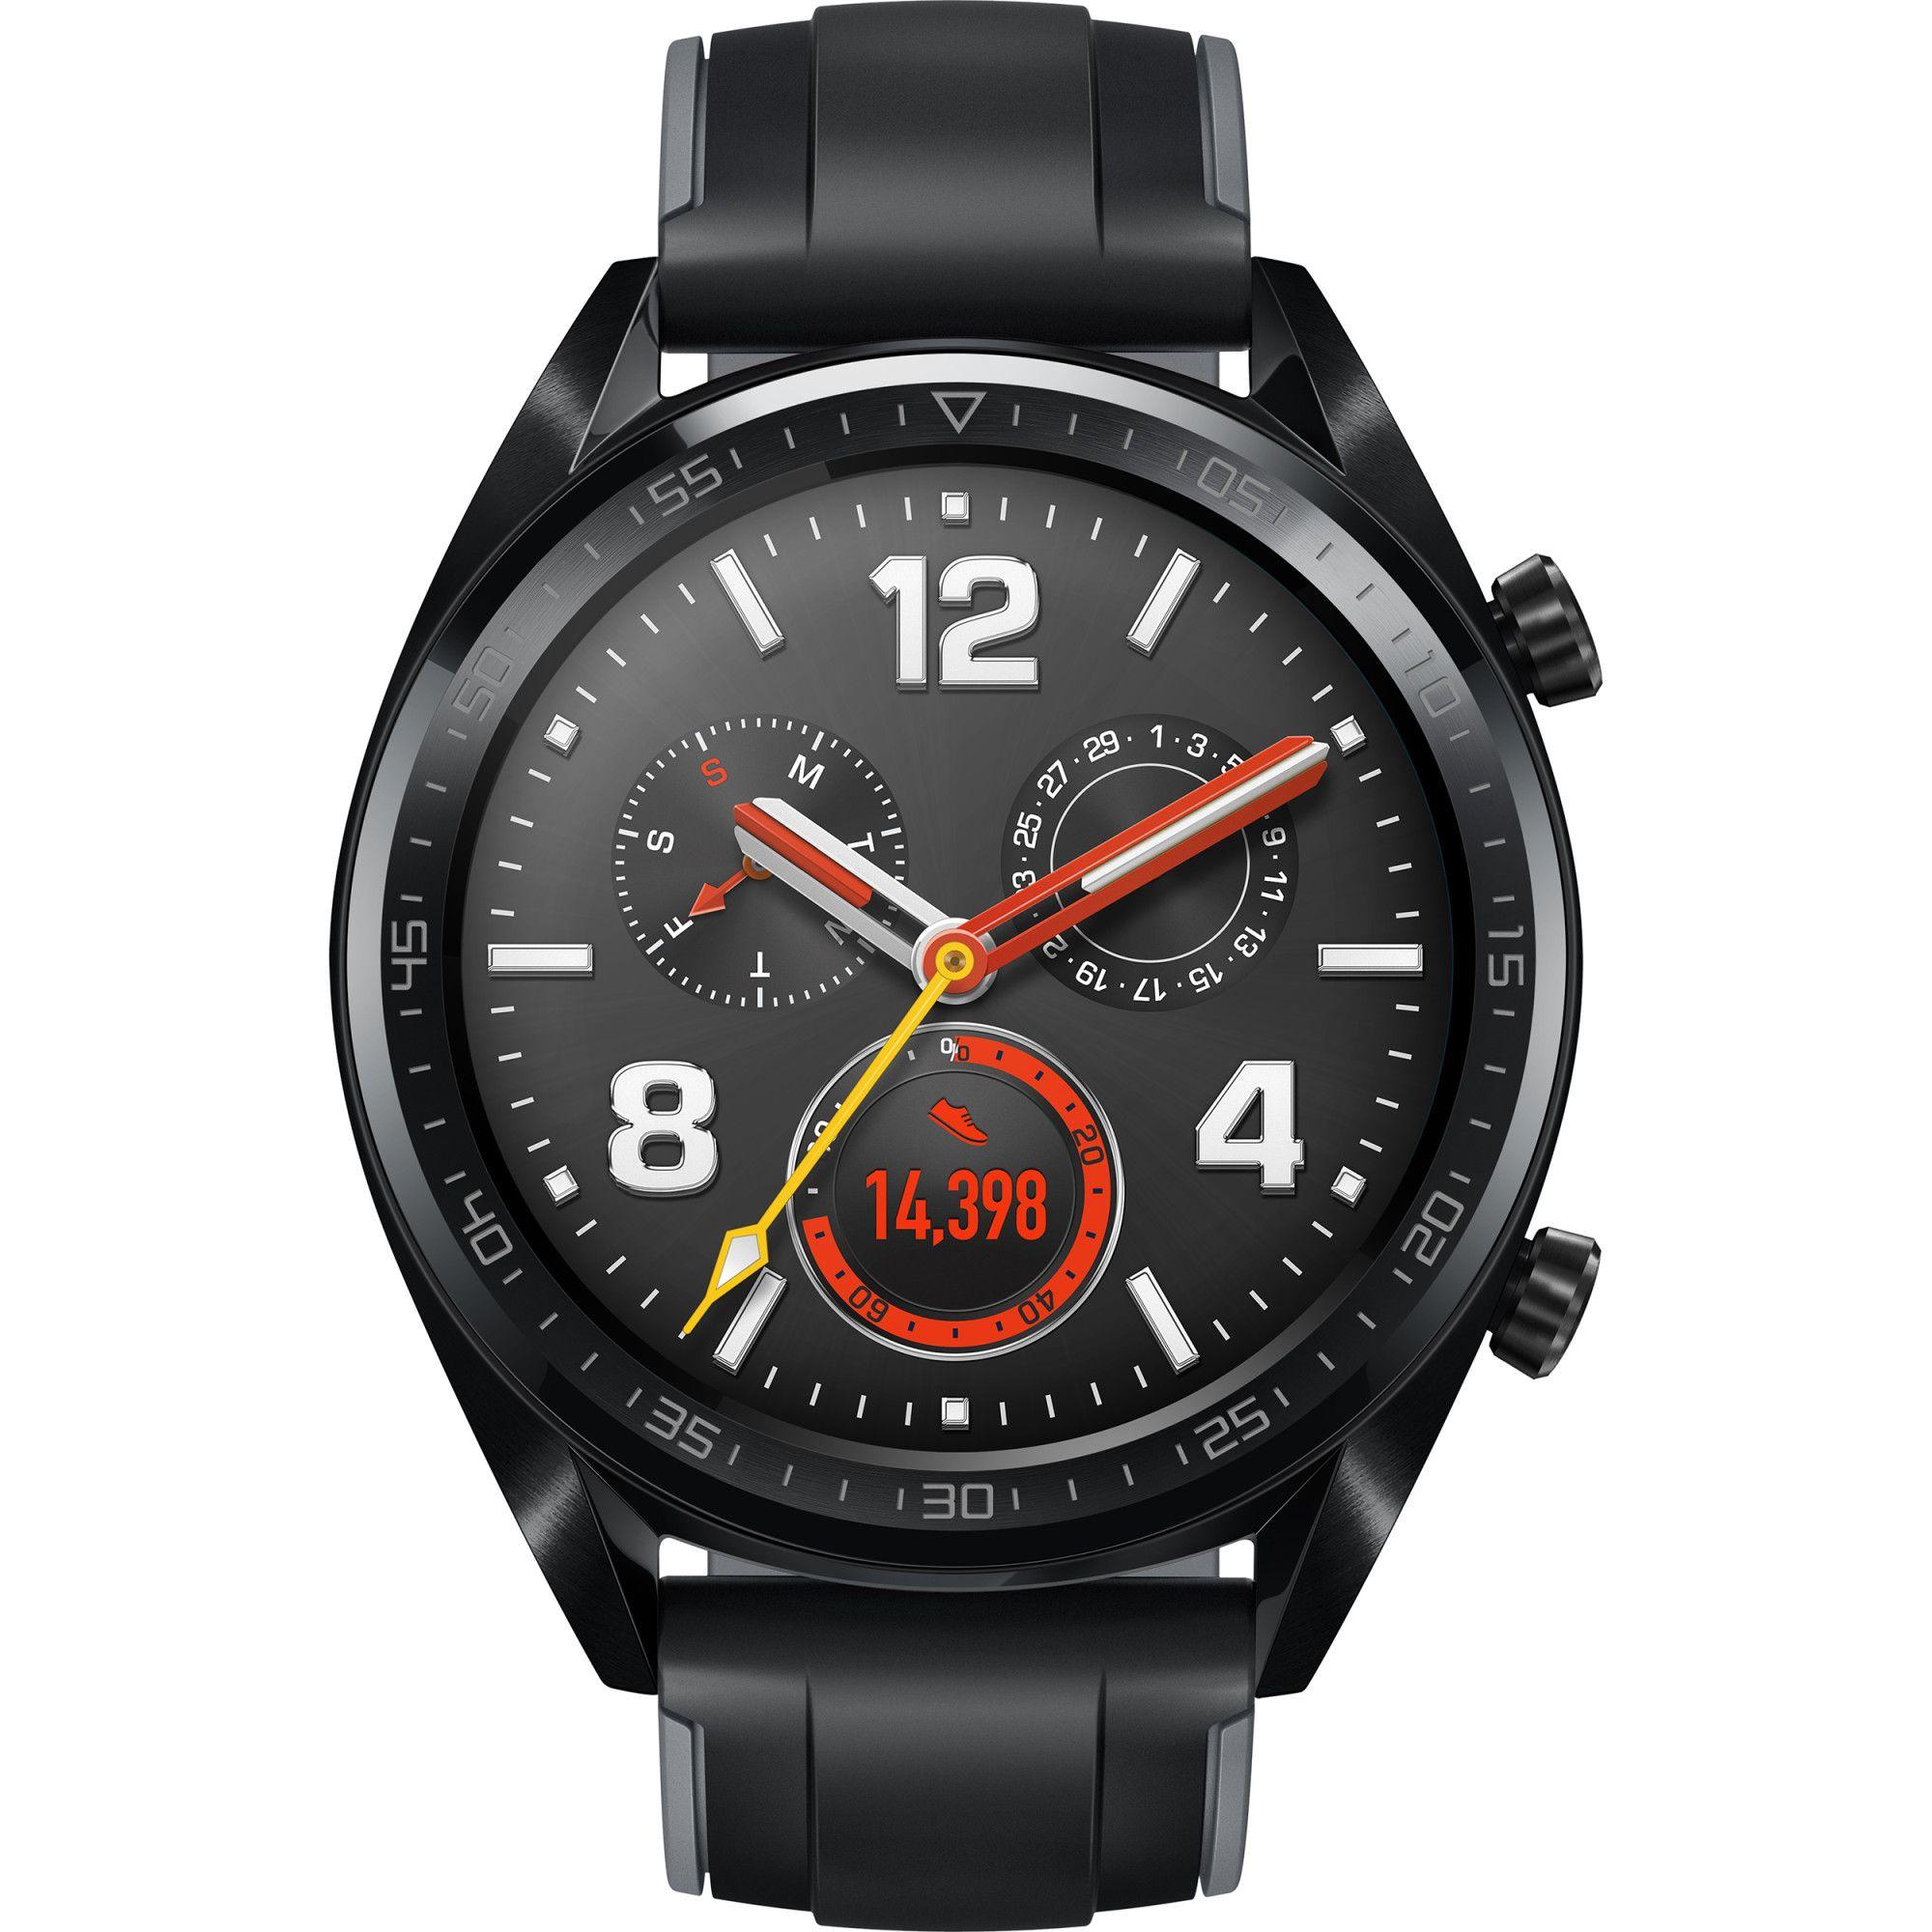 Huawei Watch Gt Full Watch Specifications Smartwatchspex